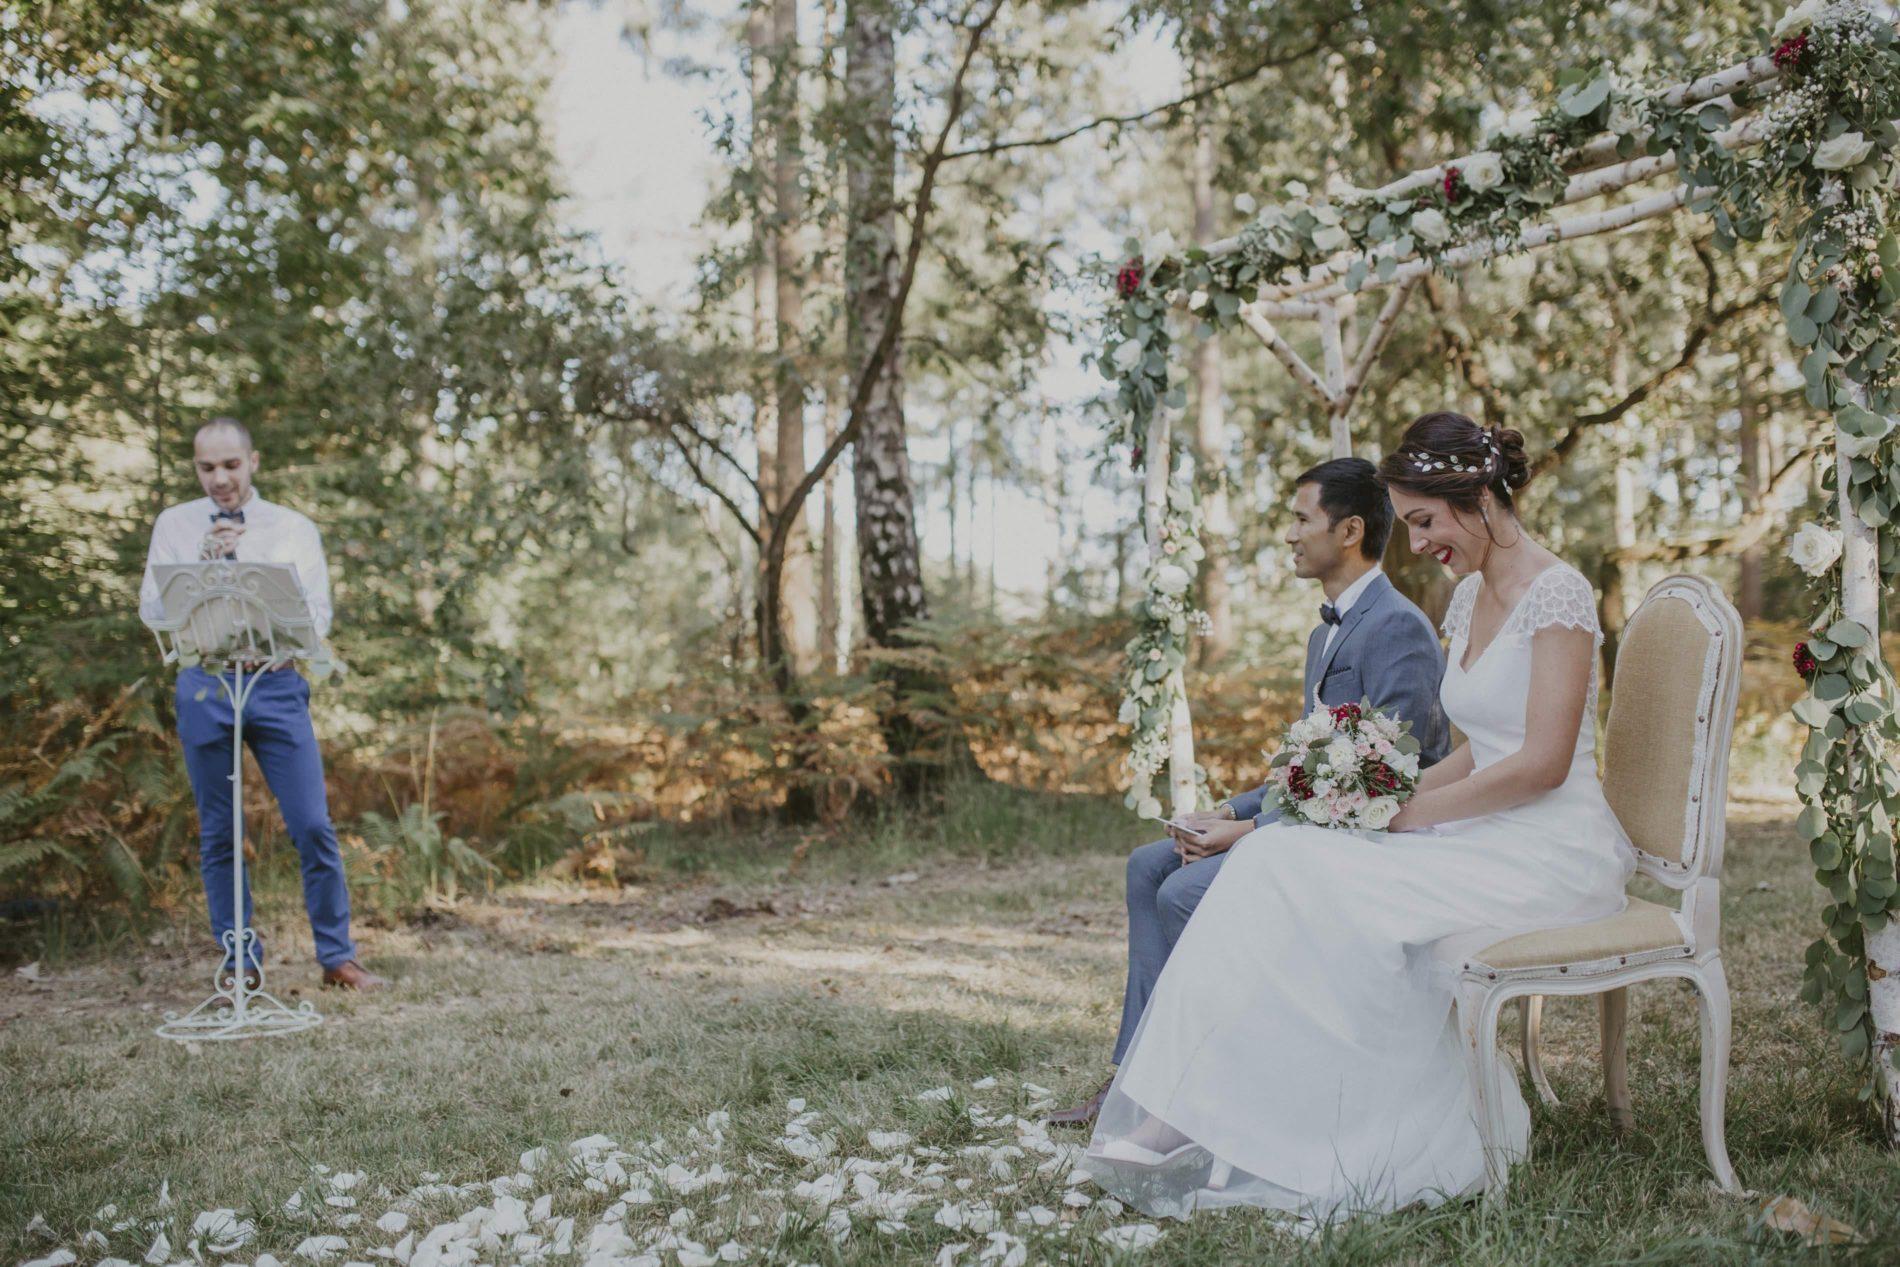 0167_03-CelineSereivuth-167-obonheurdesdames-decoration-mariage-location-Jordane-Chaillou